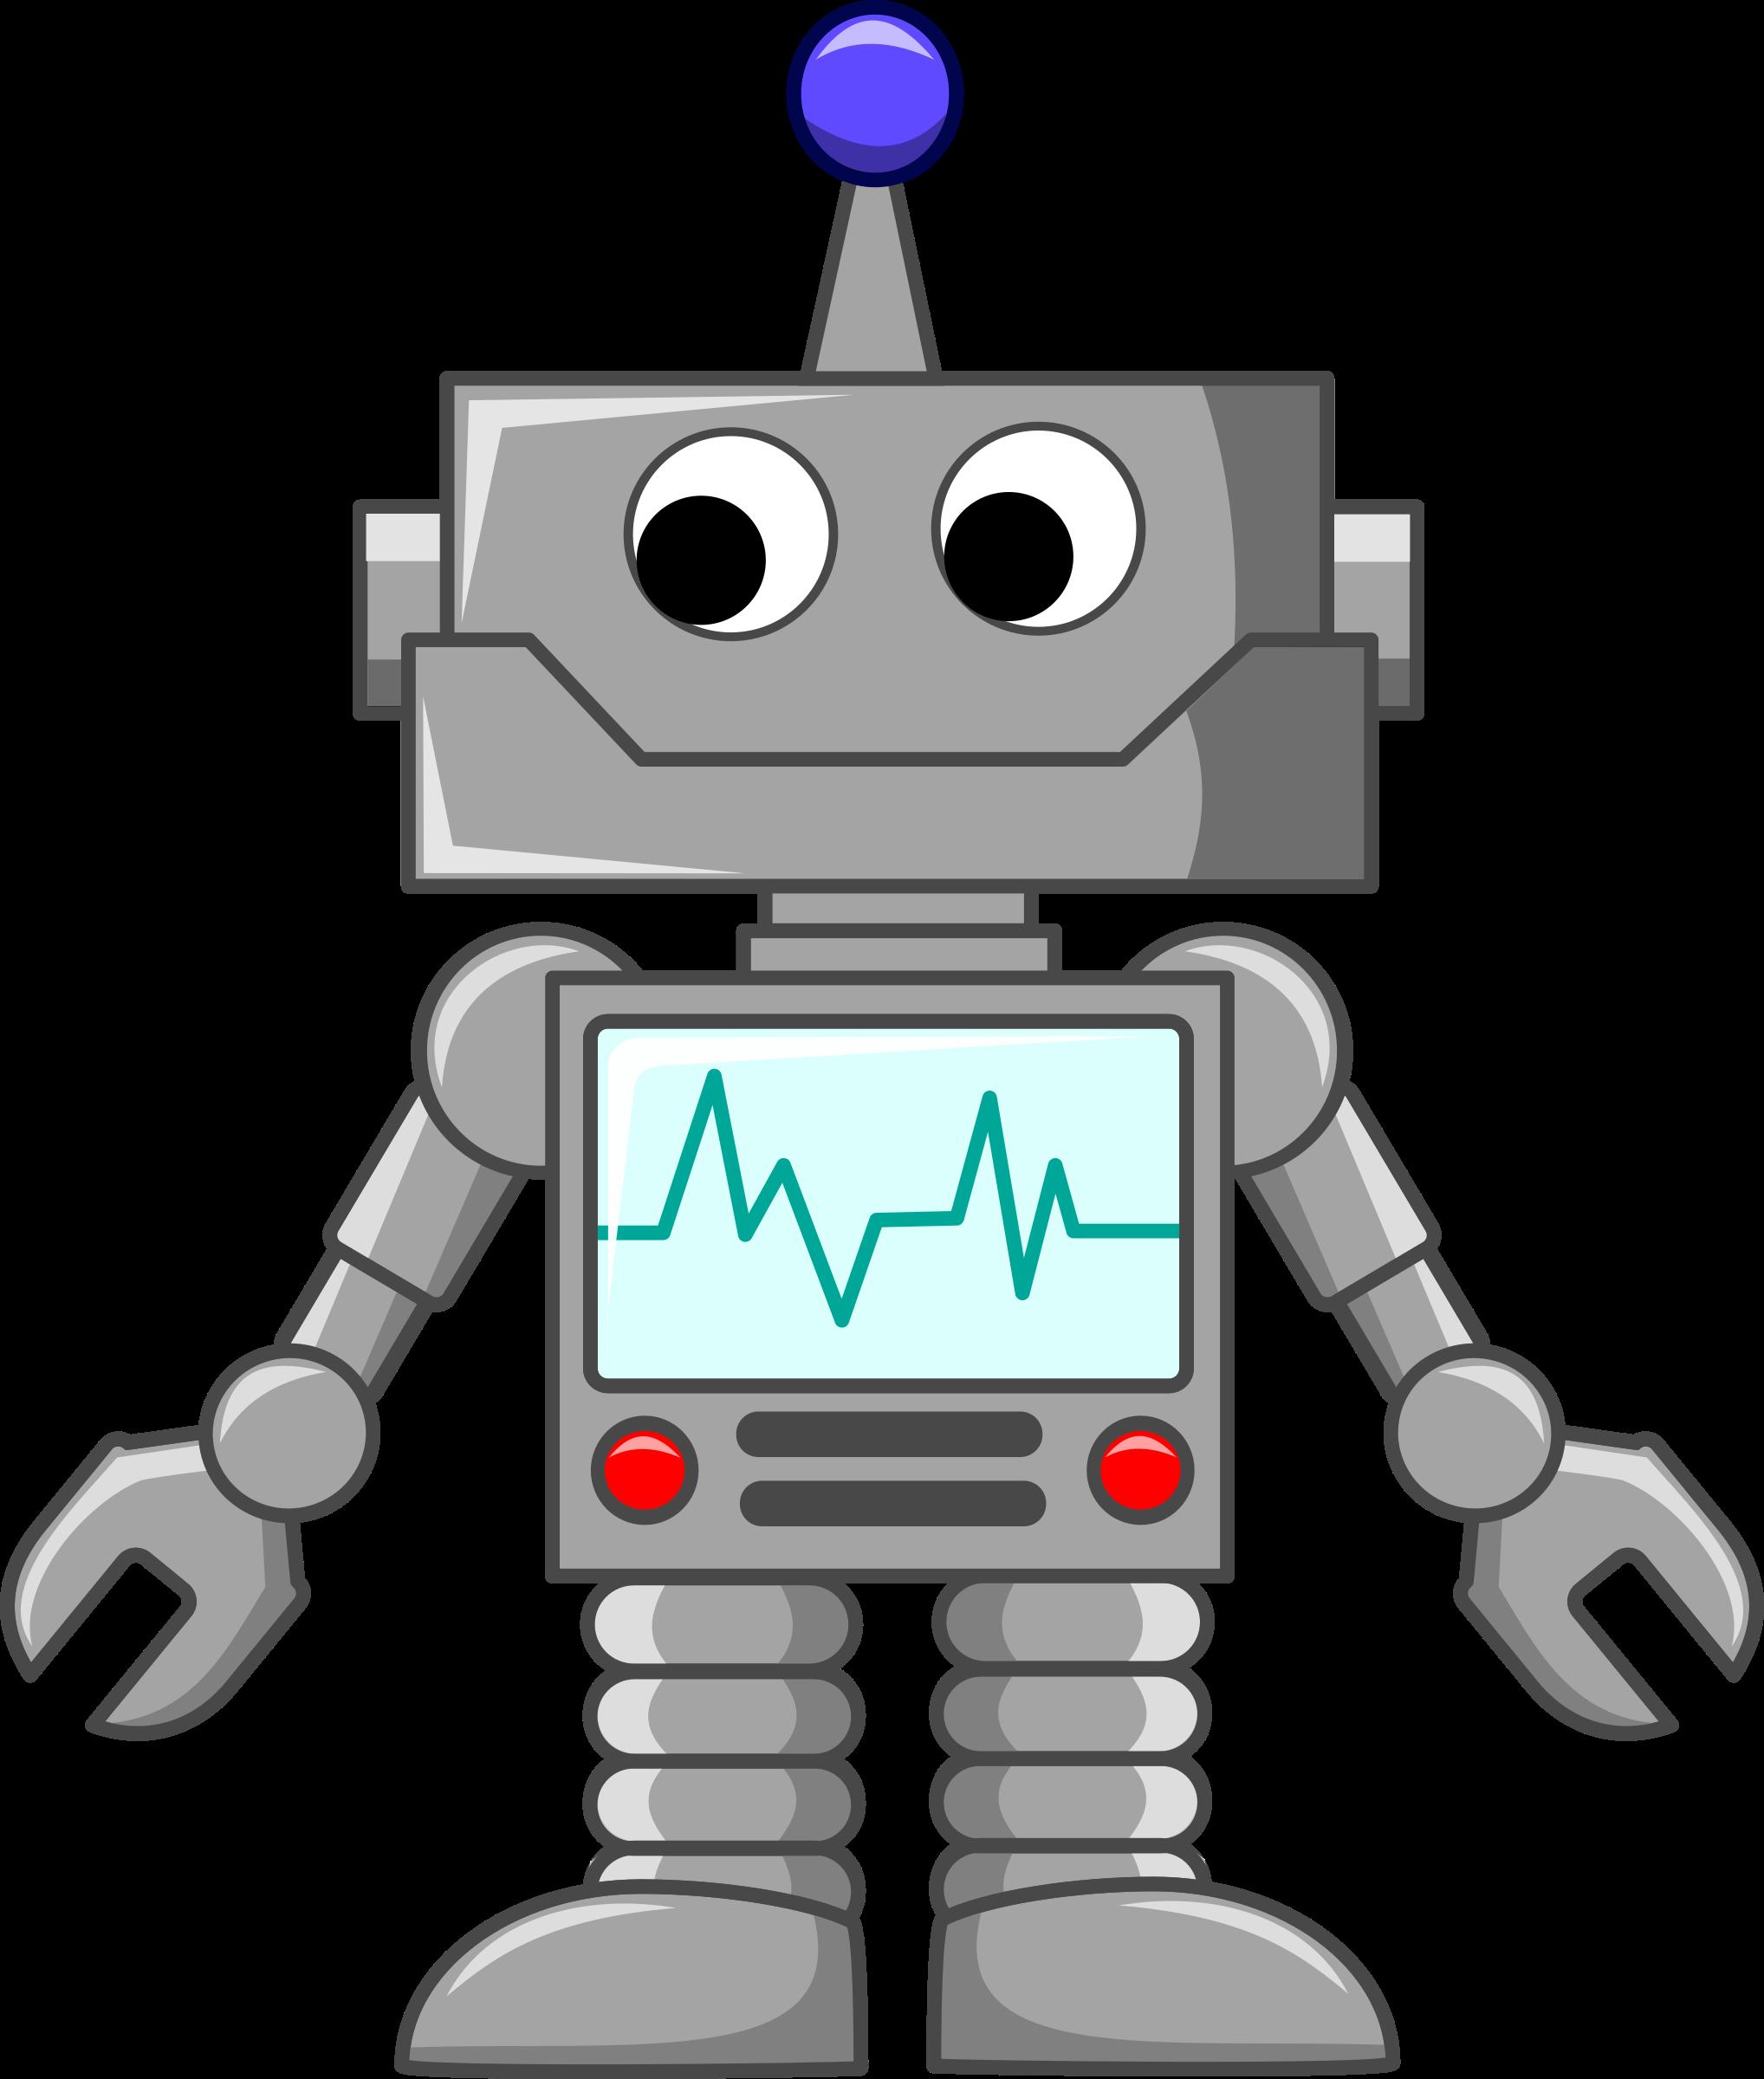 Robot clipart grey. Cartoon by sirrob fabric